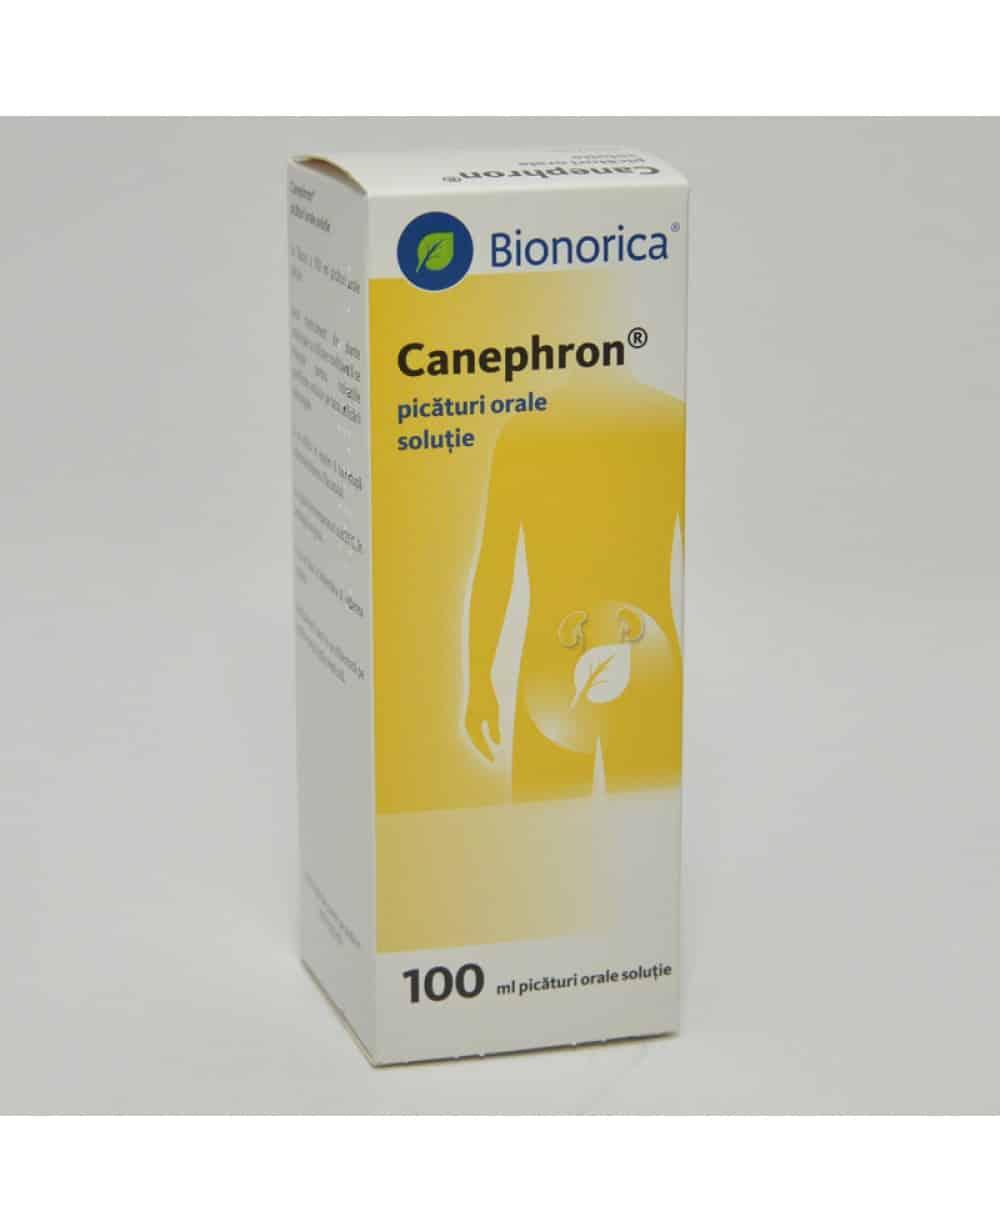 Canephron picaturi orale